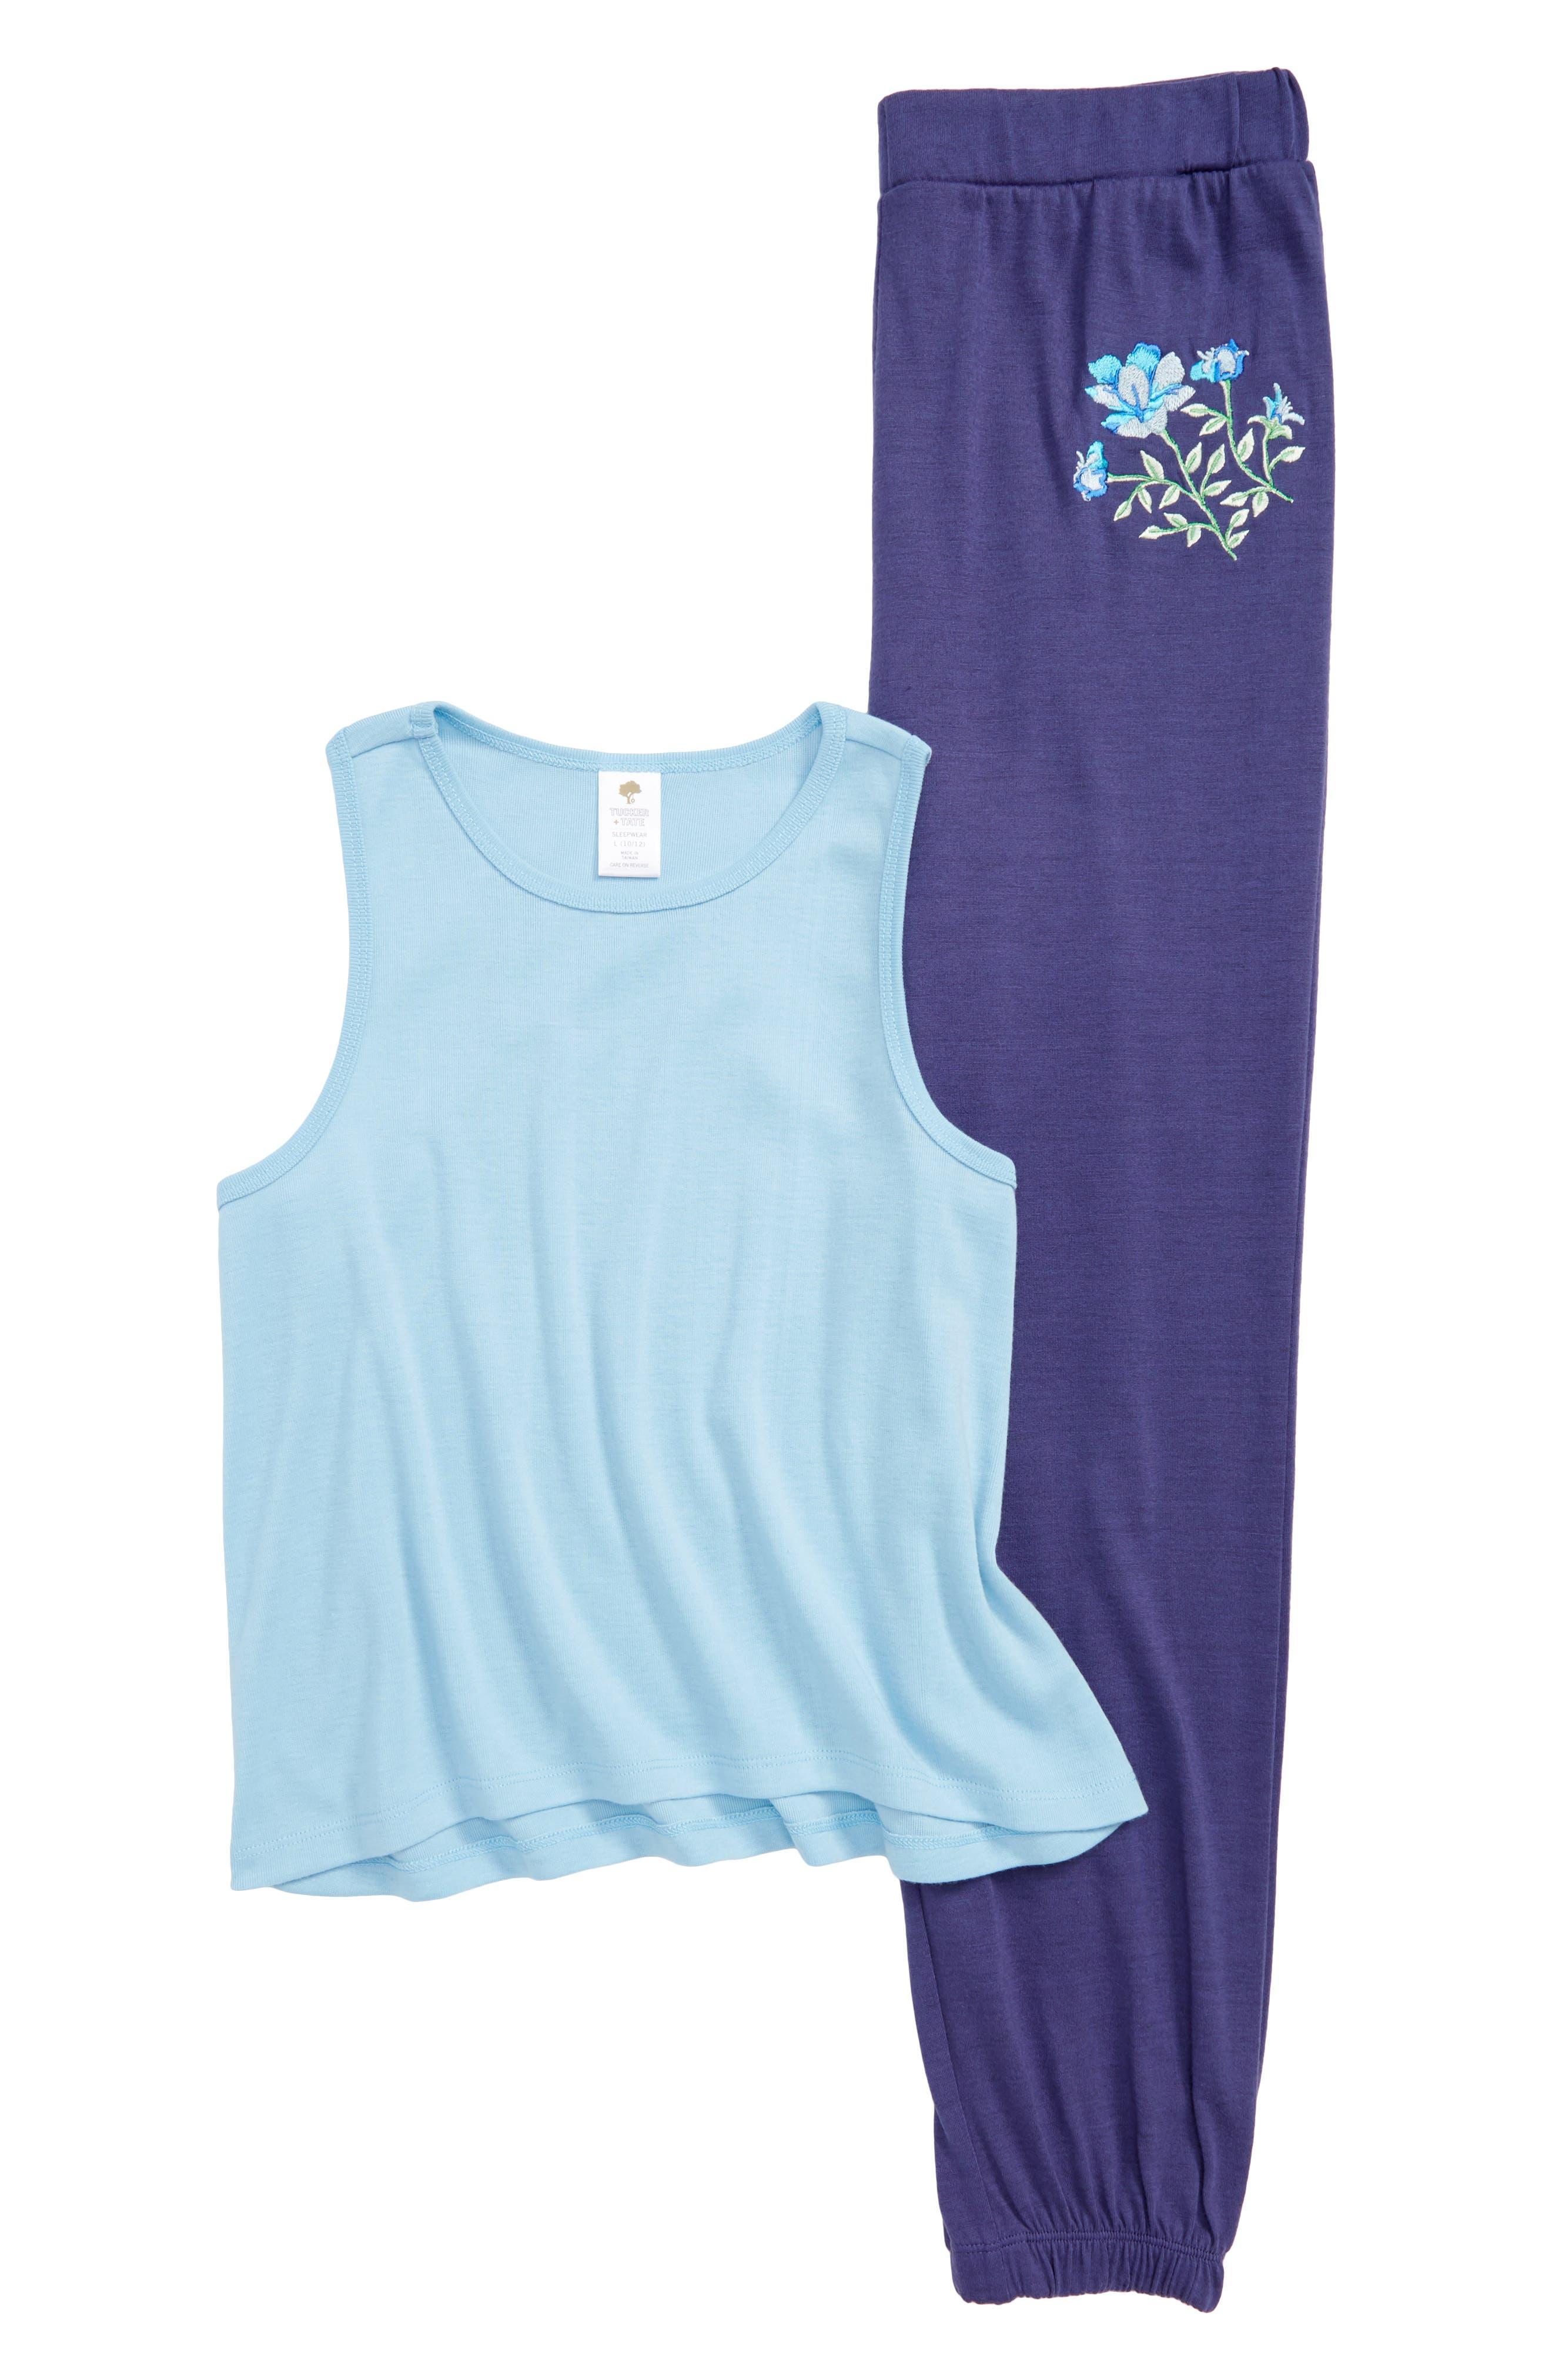 Two-Piece Pajamas Set,                             Main thumbnail 1, color,                             420